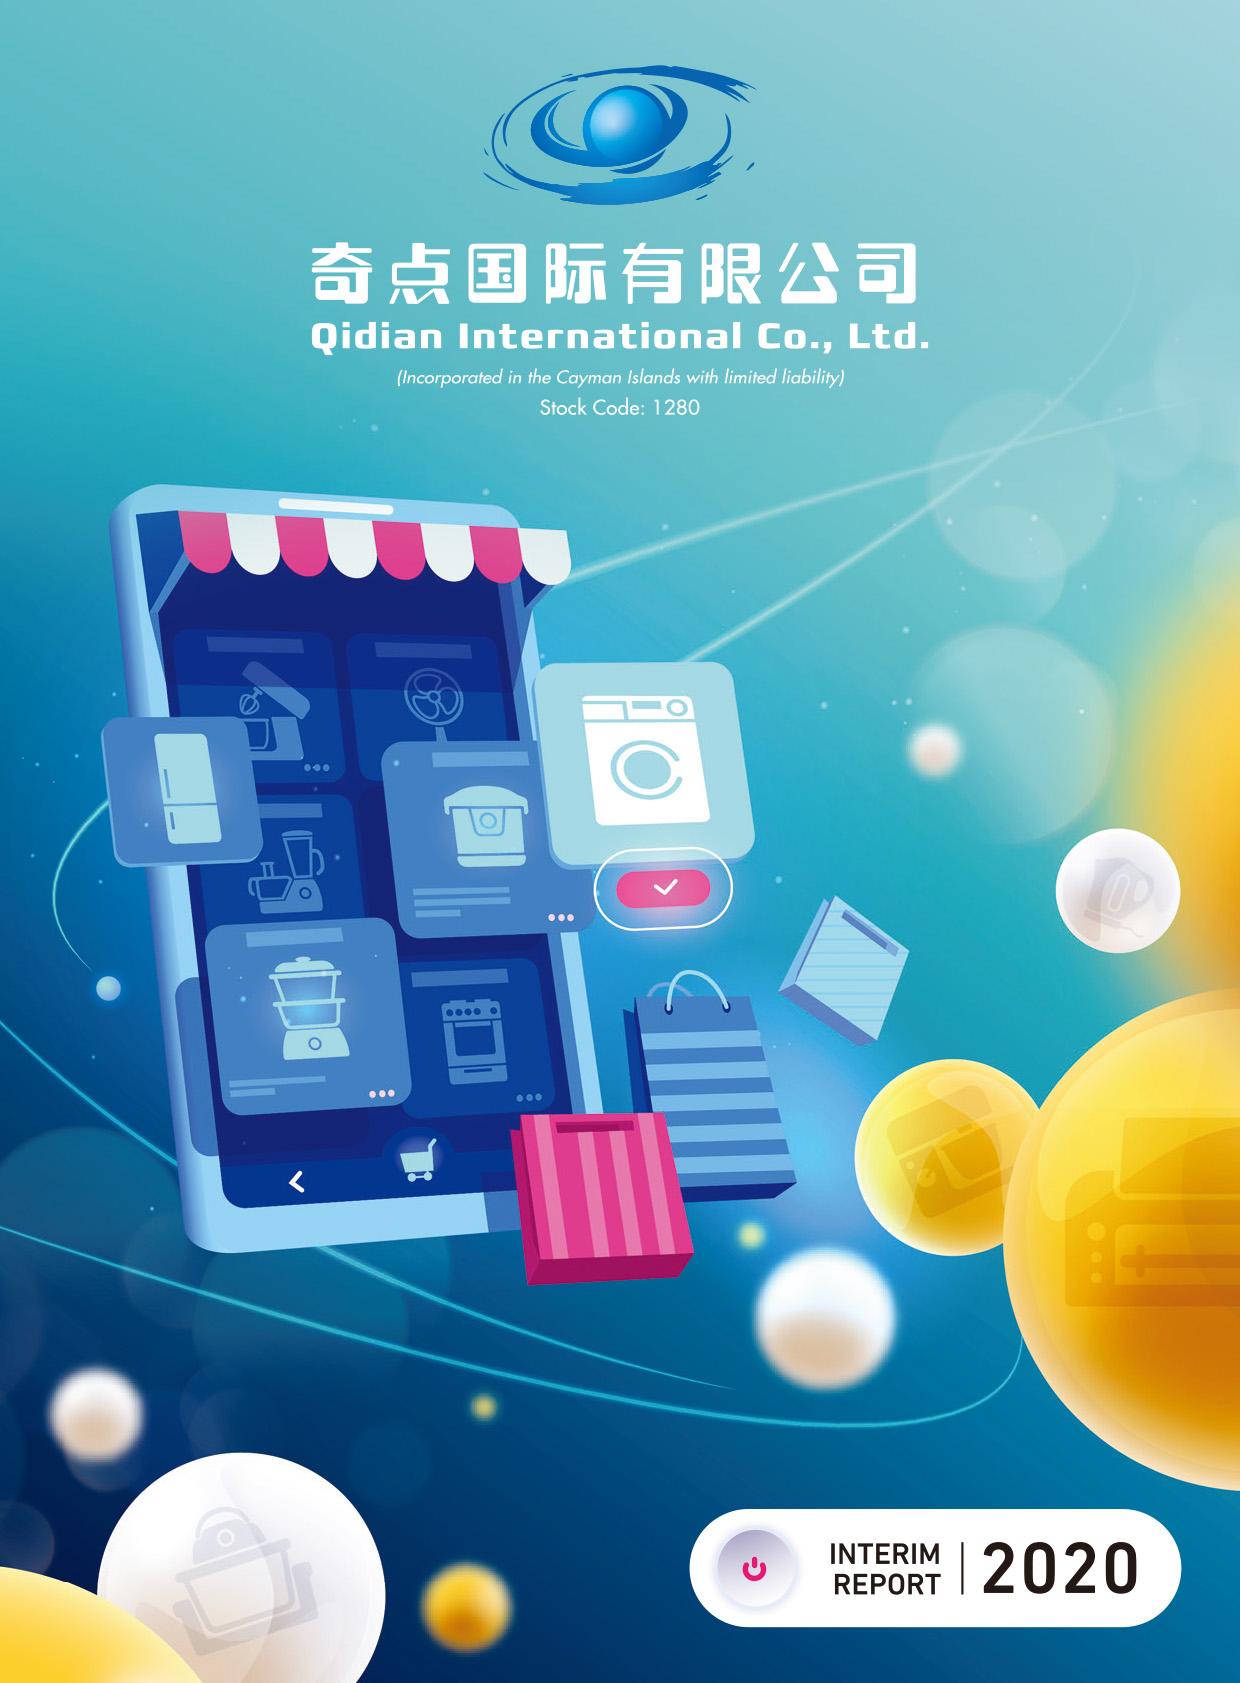 Qidian International Co., Ltd.